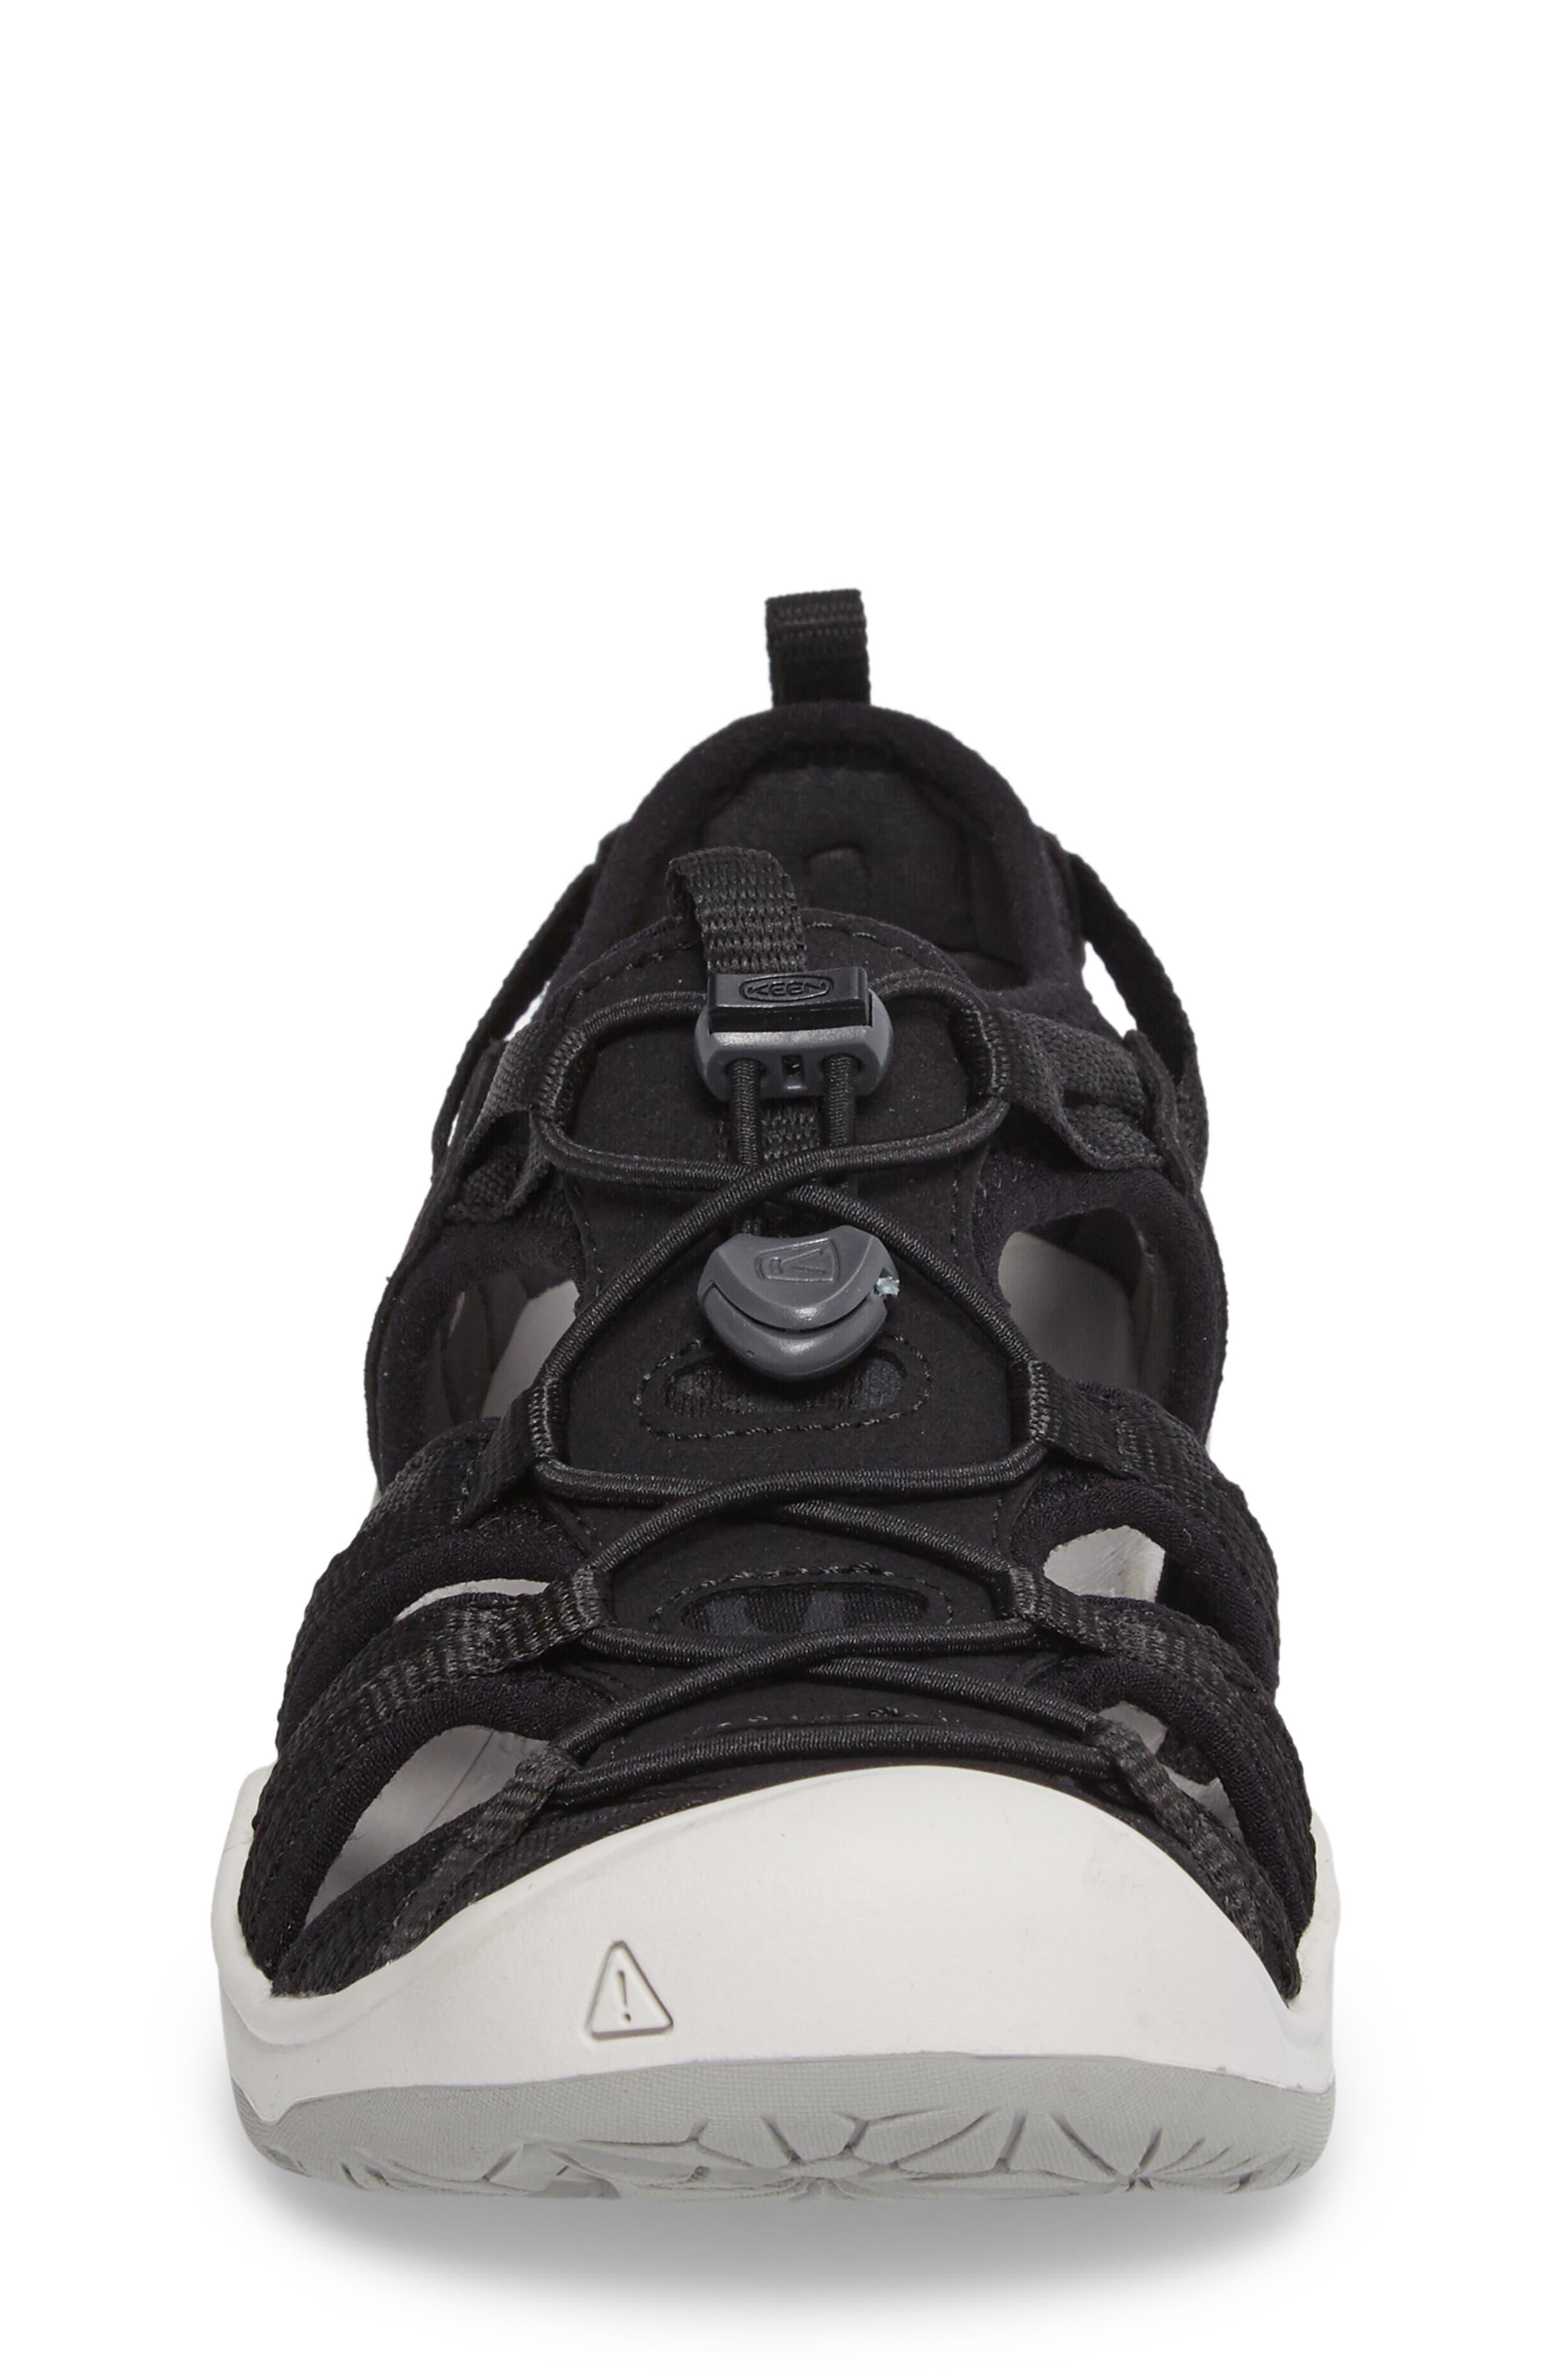 KEEN, Moxie Water Friendly Sandal, Alternate thumbnail 4, color, BLACK/ VAPOR